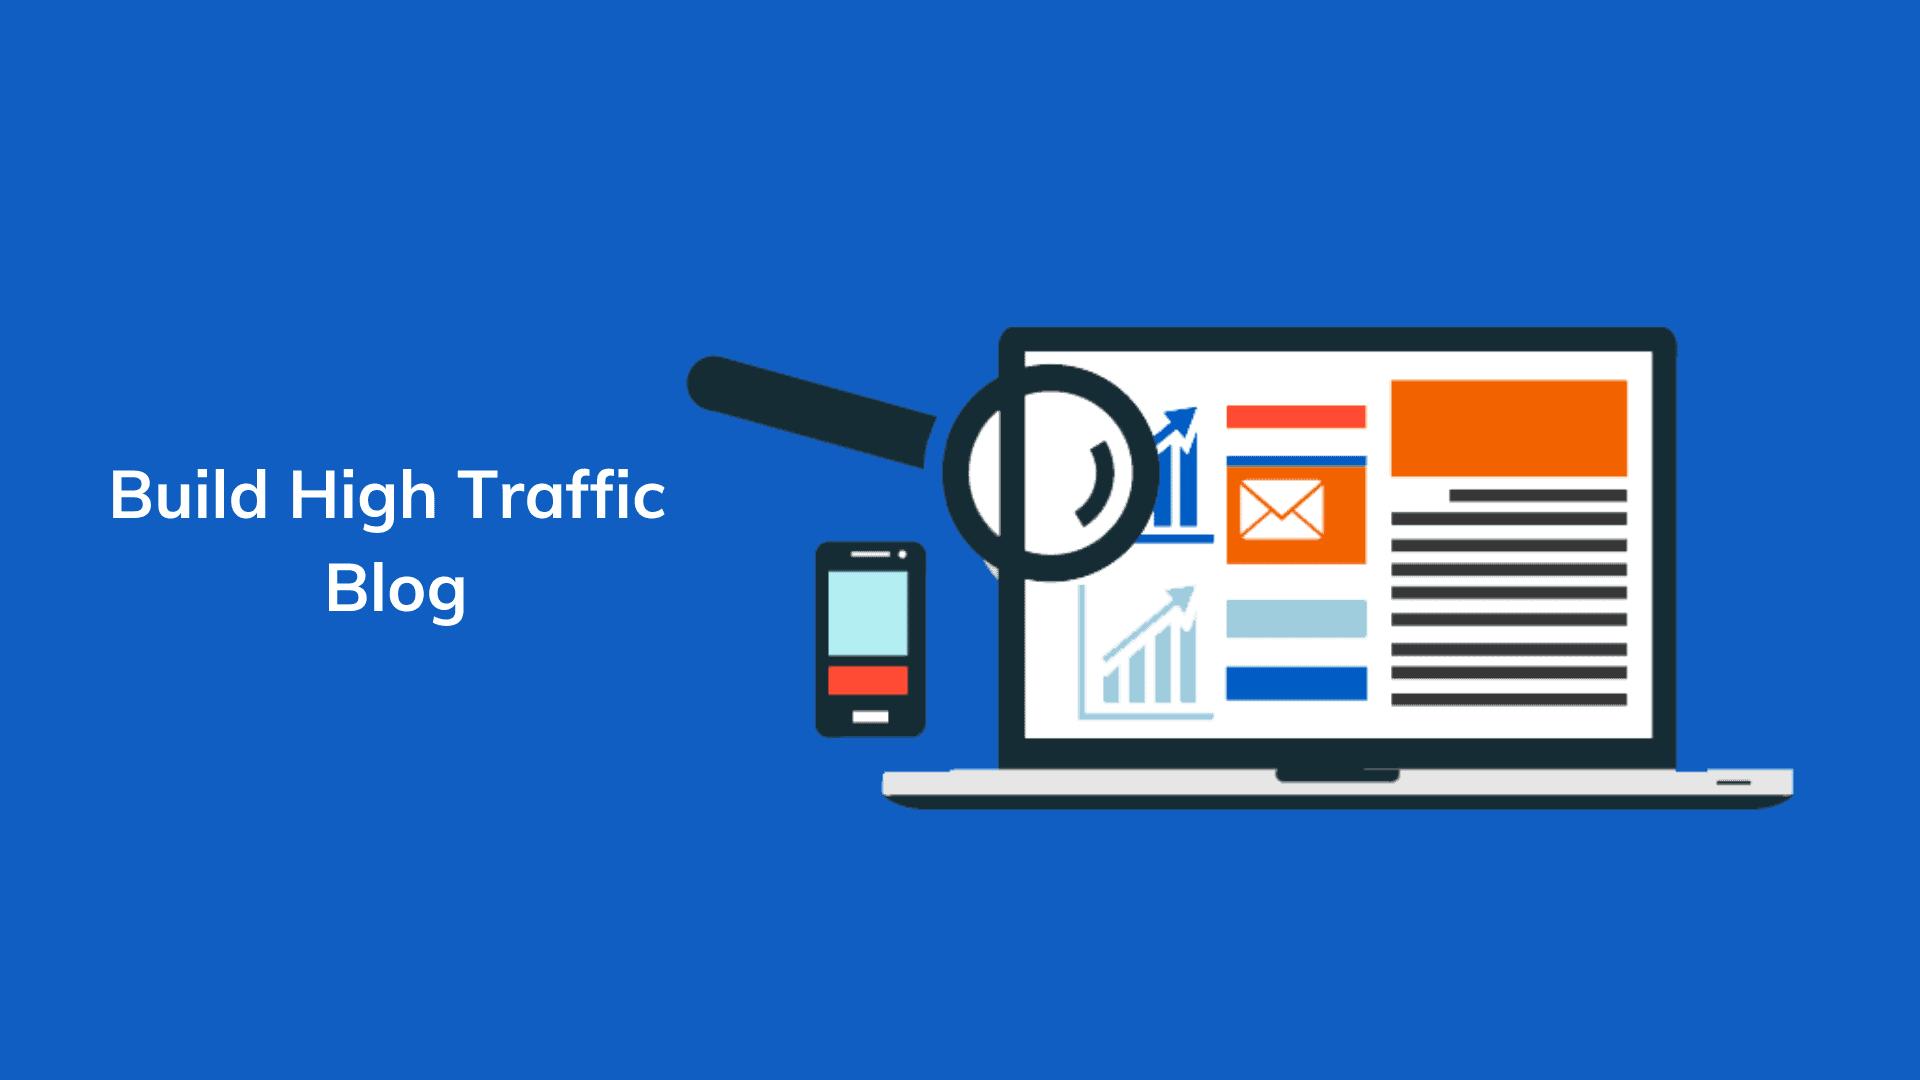 build-high-traffic-blog